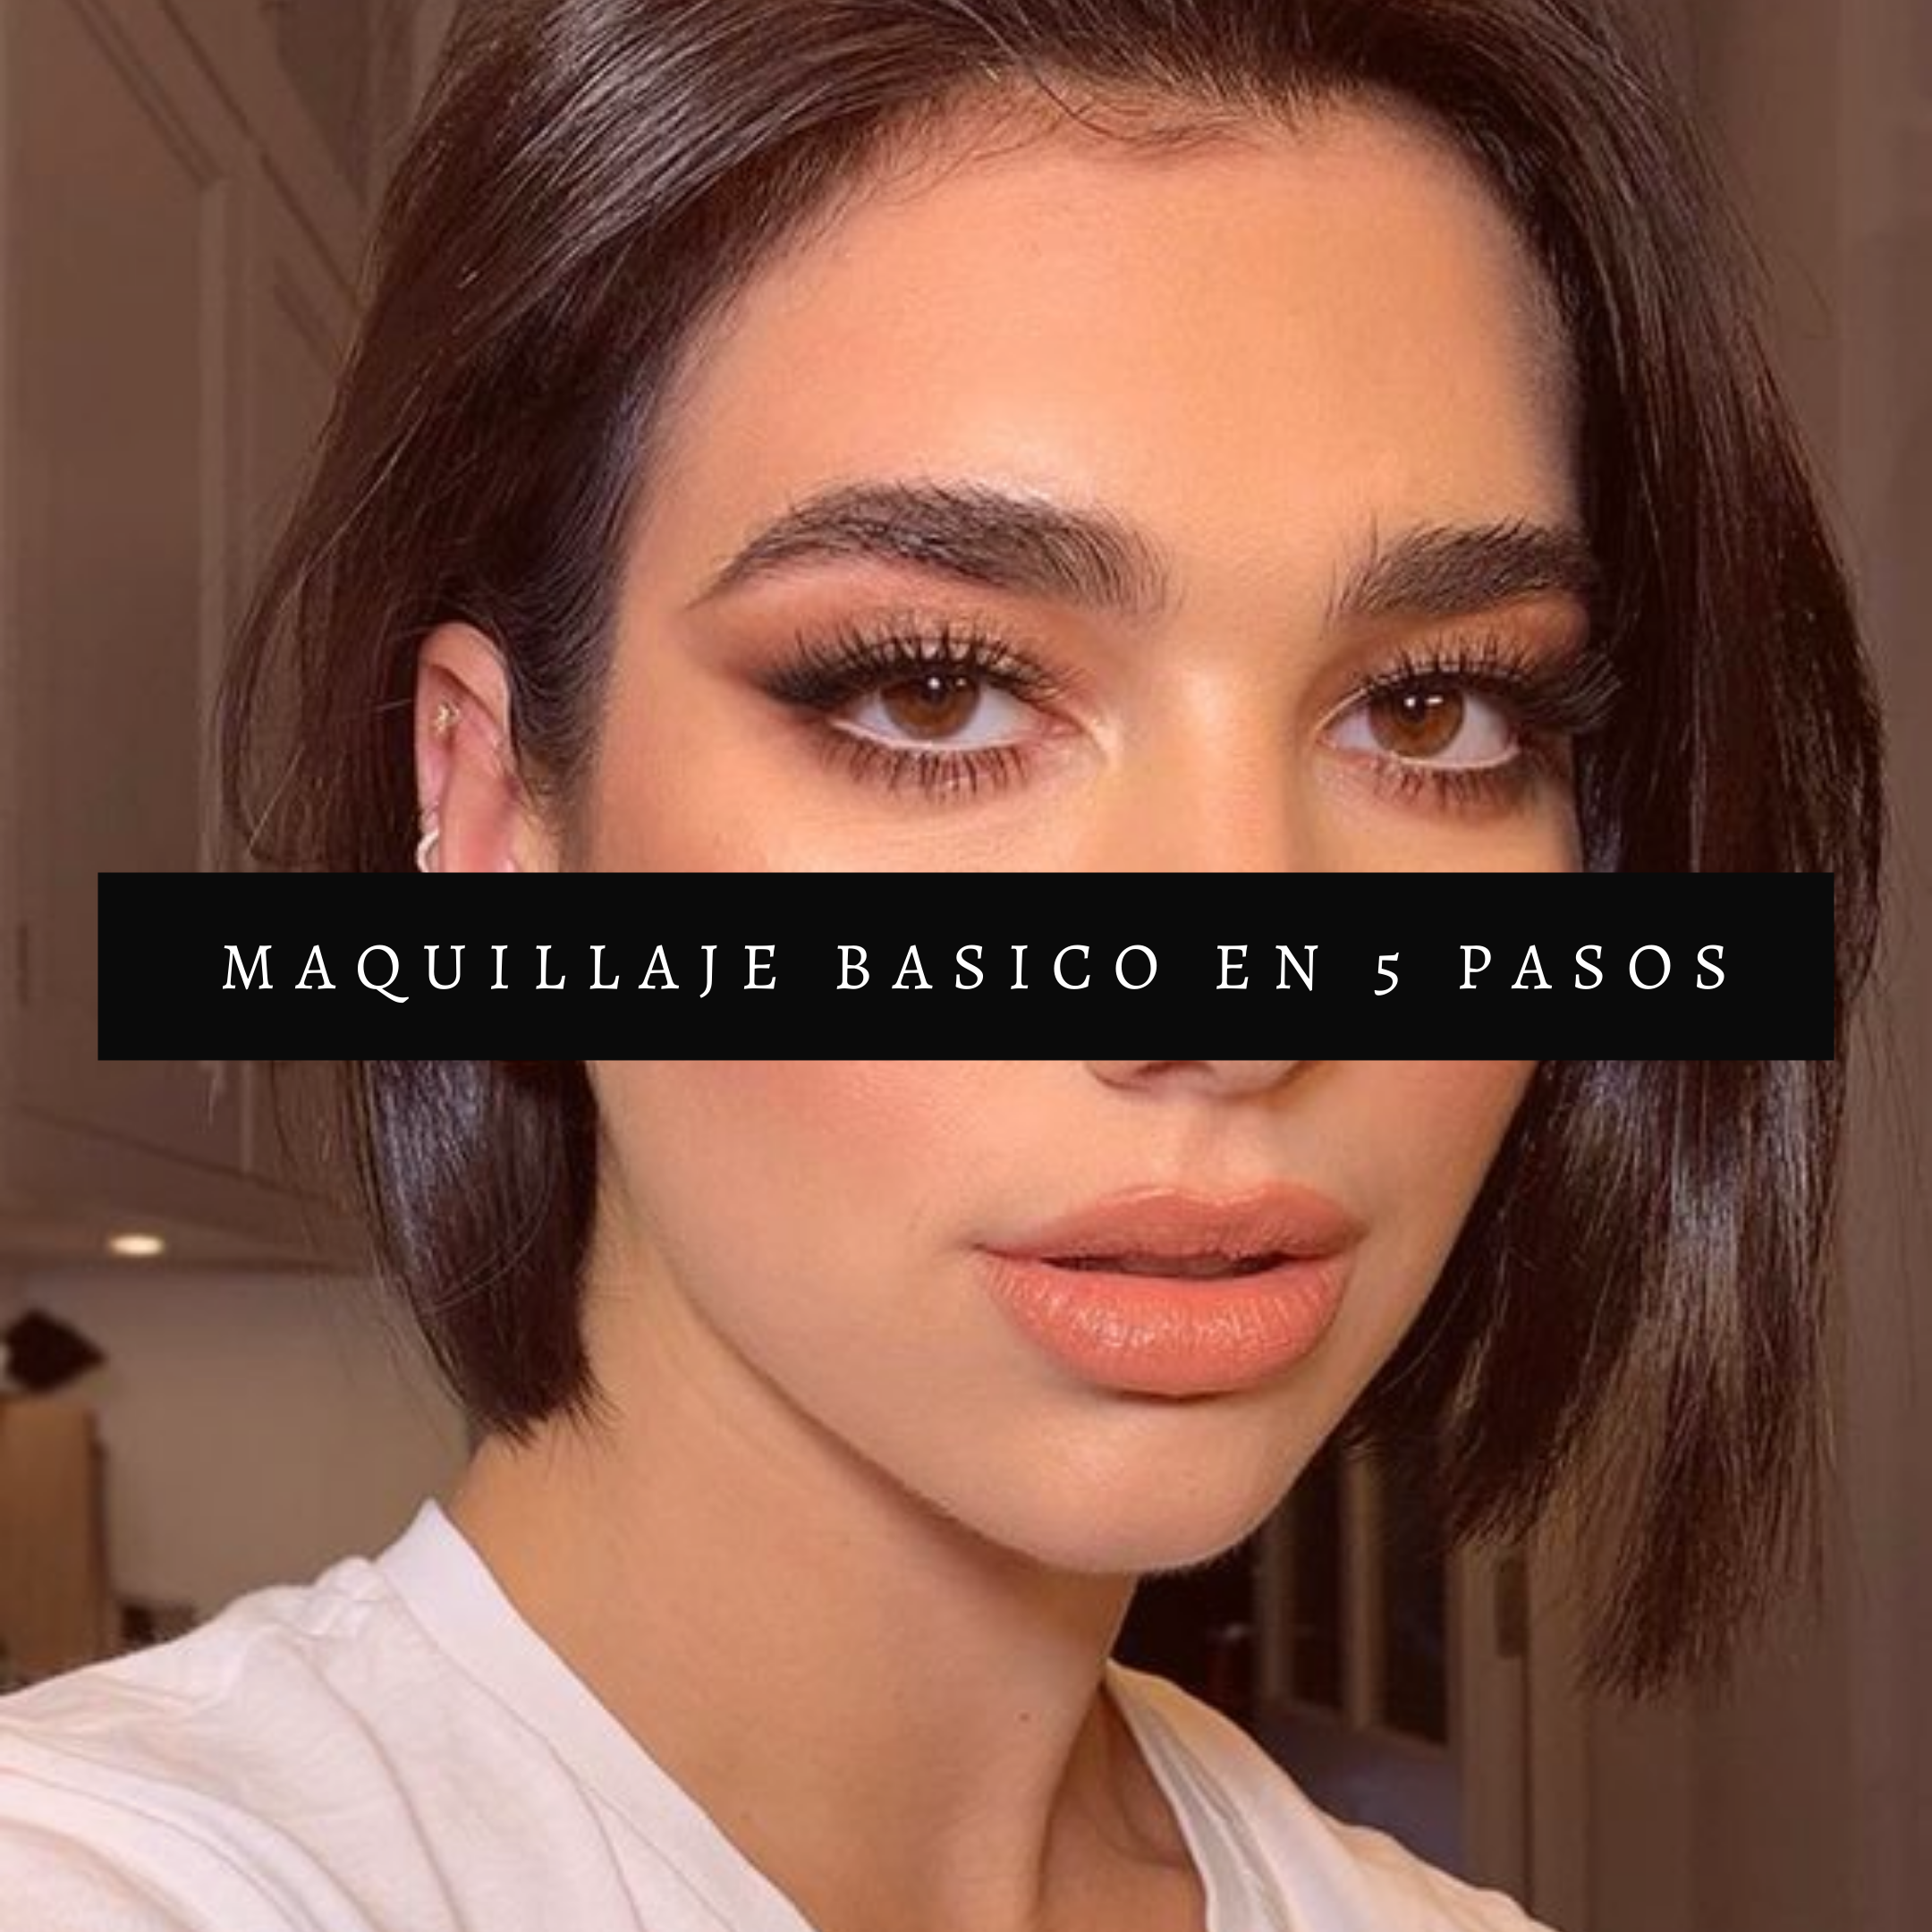 Maquillaje Basico  – Maquillaje